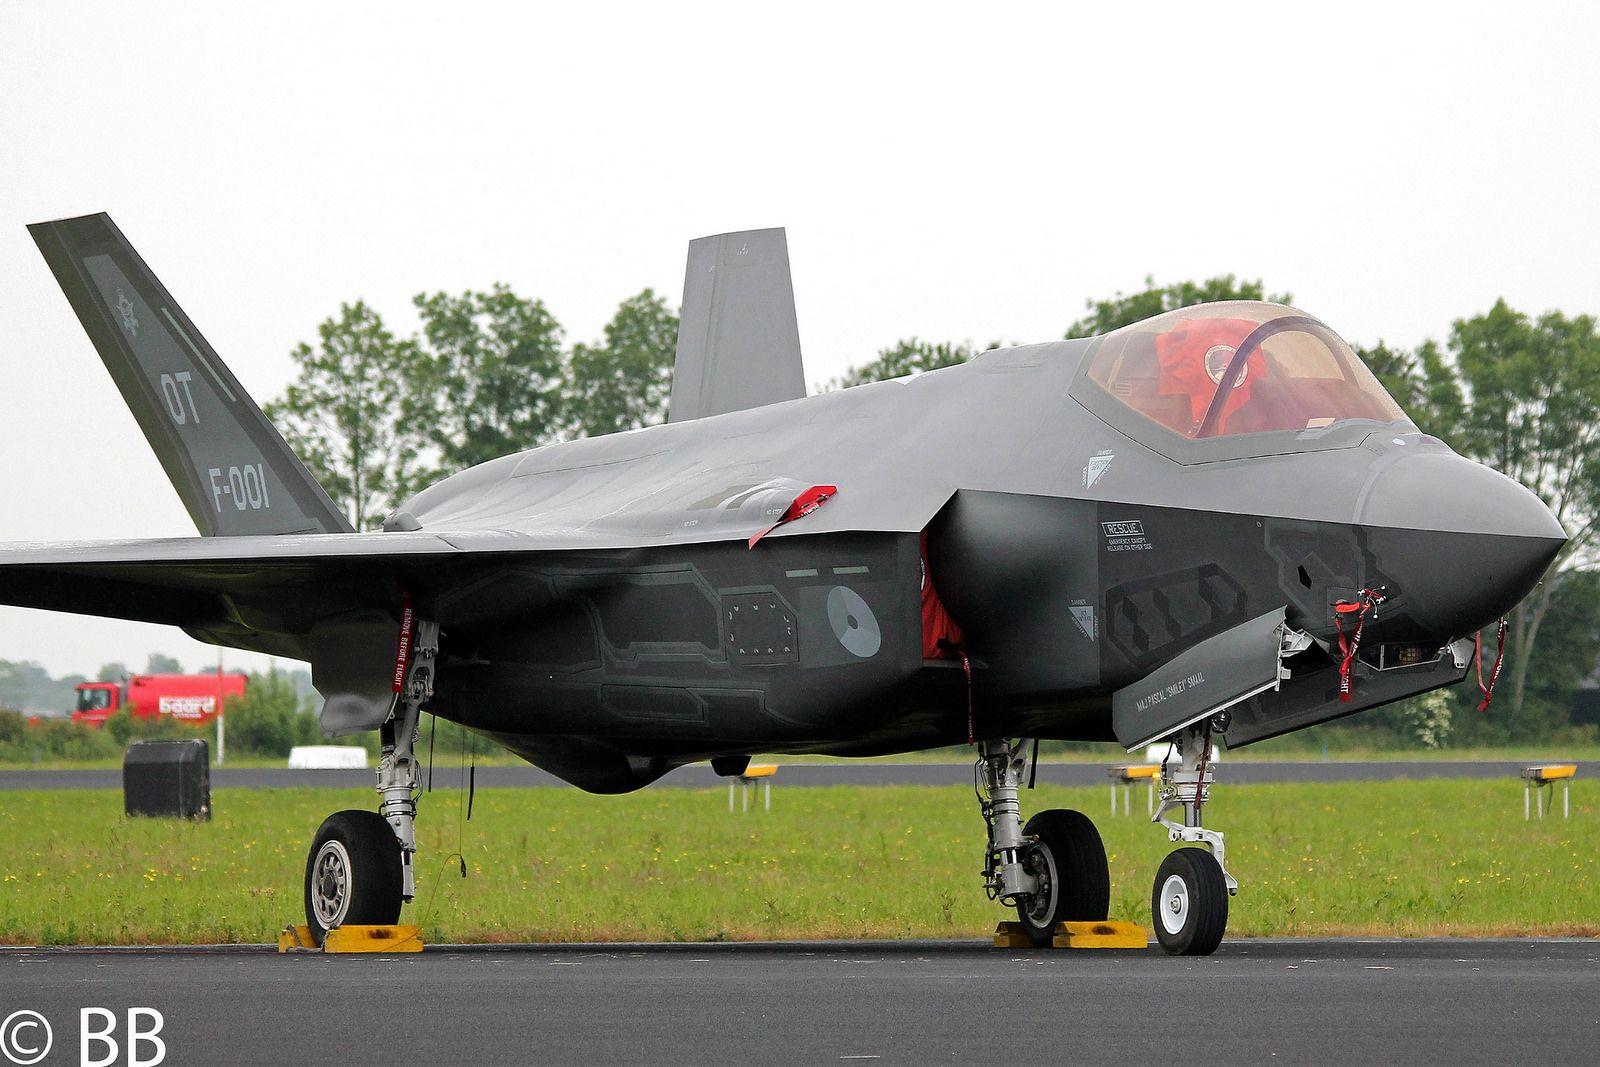 16-06-11, Royal Netherlands Air Force, F-35 Lightning II, F-001, Luchtmachtdagen, Vliegbasis Leeuwarden